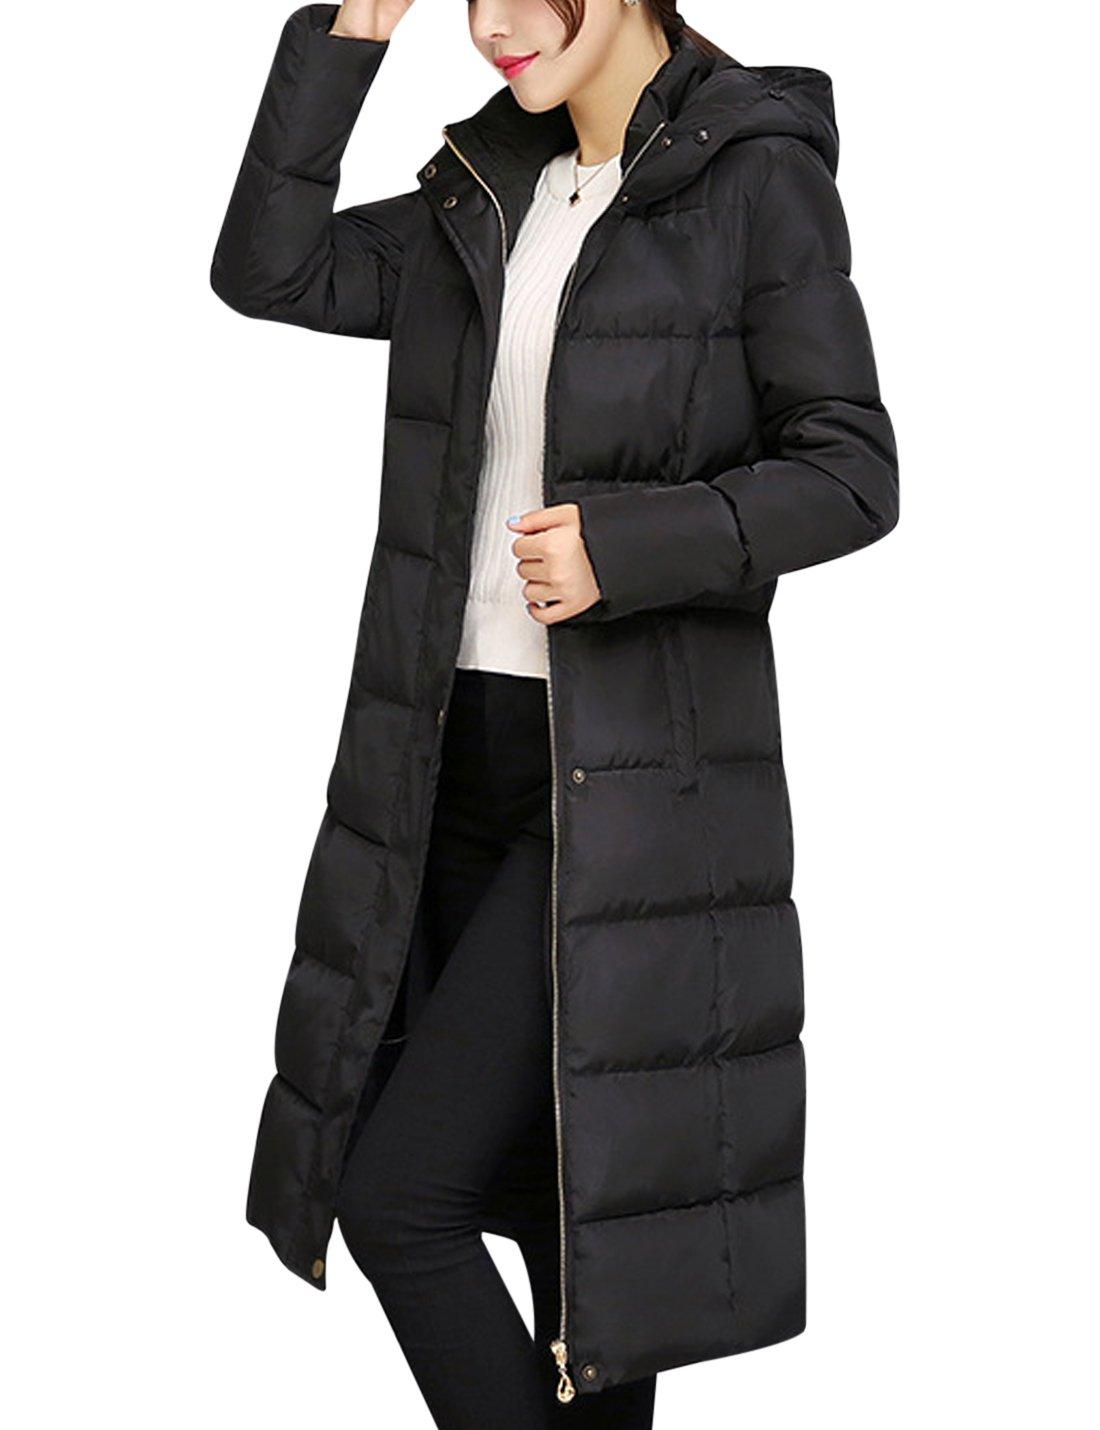 Tanming Women's Winter Cotton Padded Long Coat Outerwear With Fur Trim Hood (Large, Black) by Tanming (Image #4)